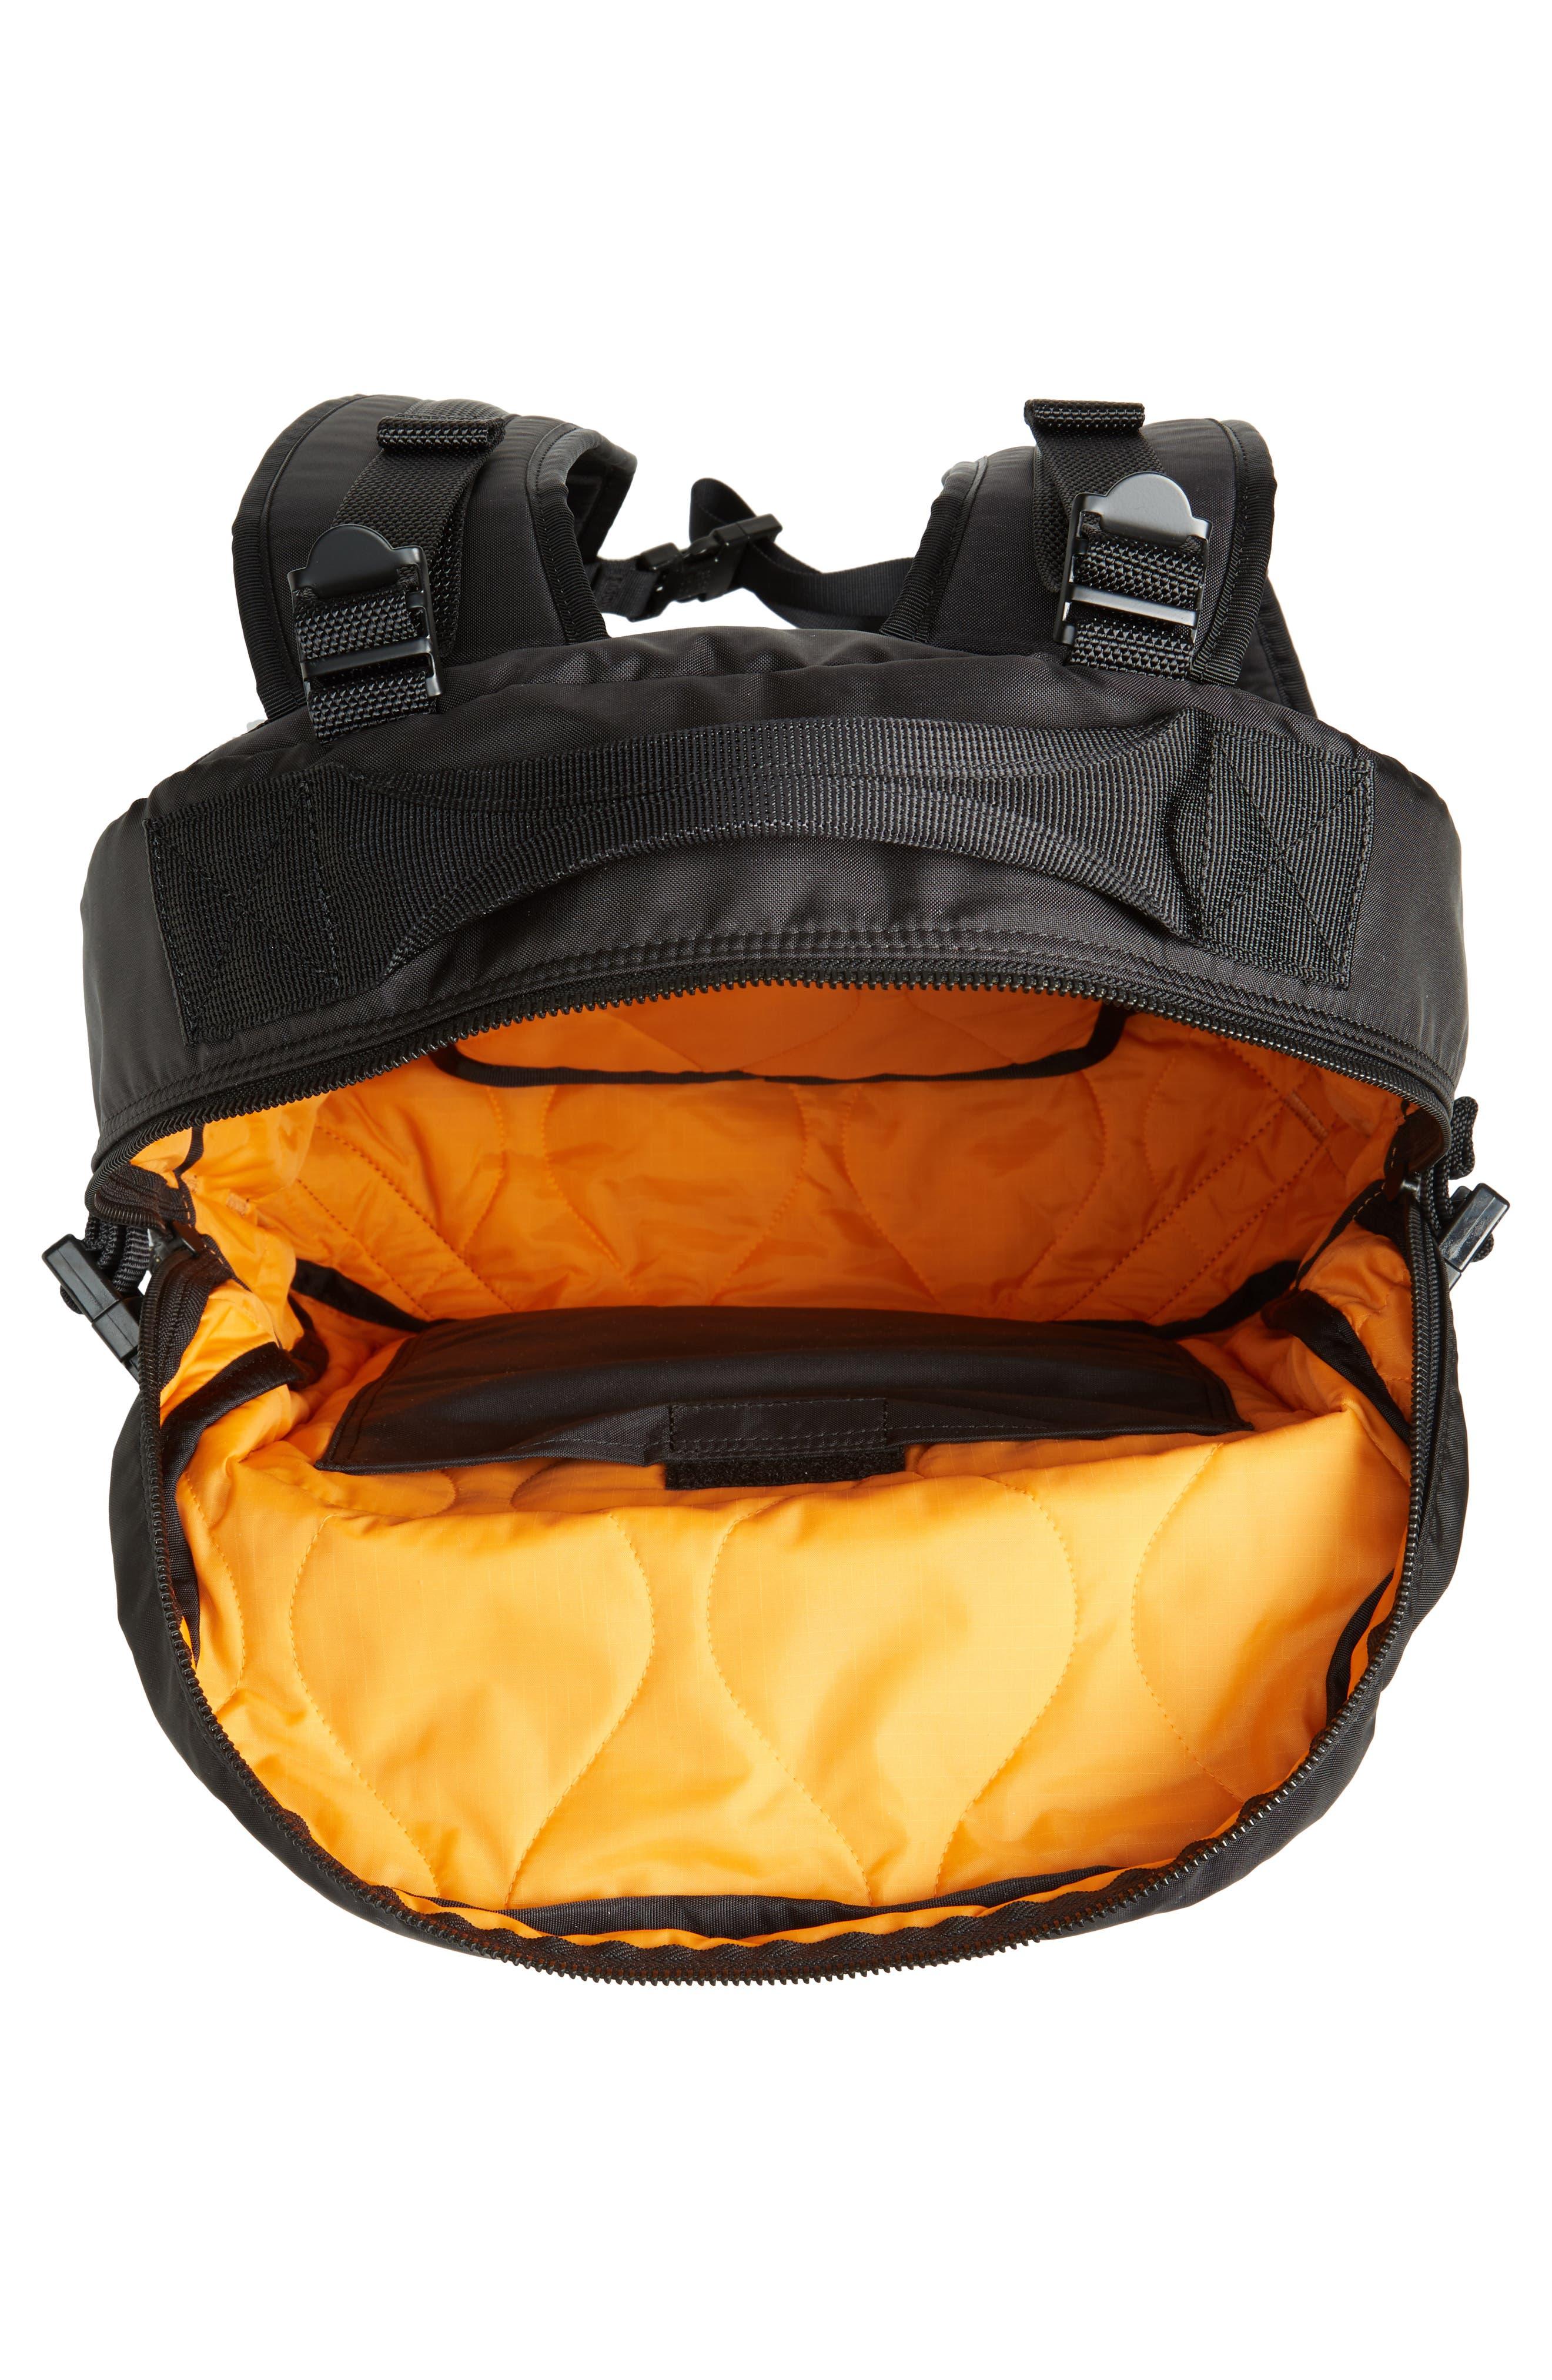 Porter-Yoshida & Co. Force Backpack,                             Alternate thumbnail 4, color,